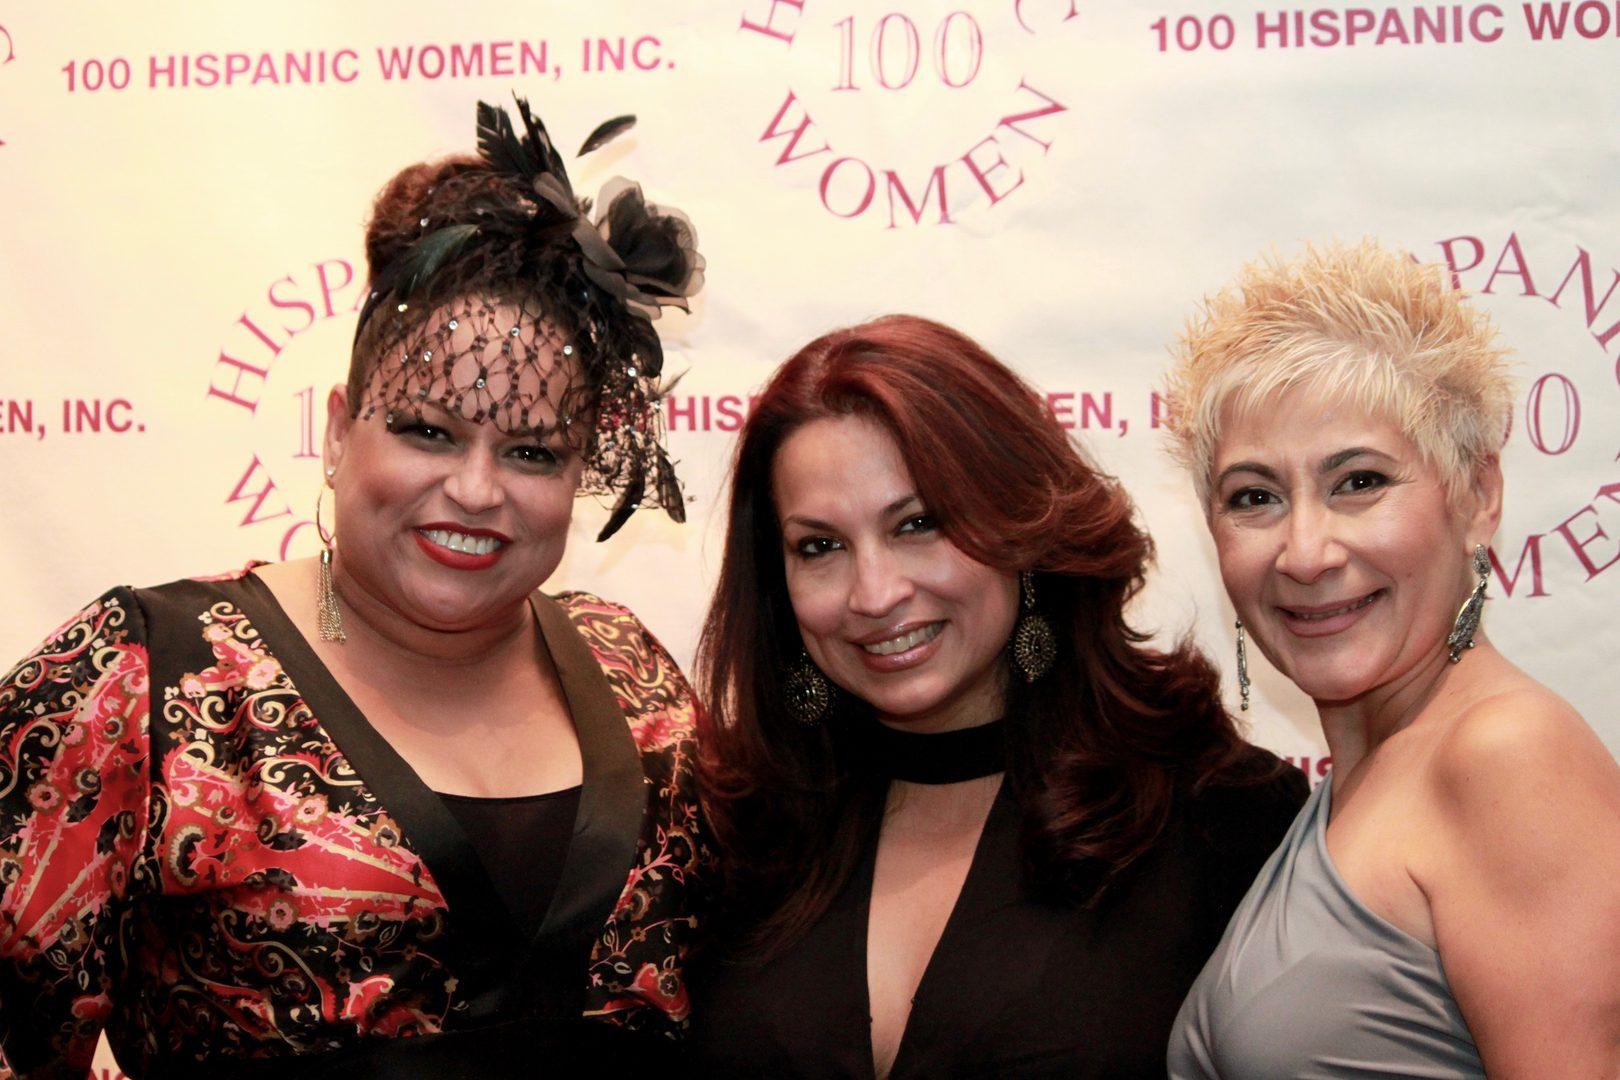 Three happy gorgeous-looking women